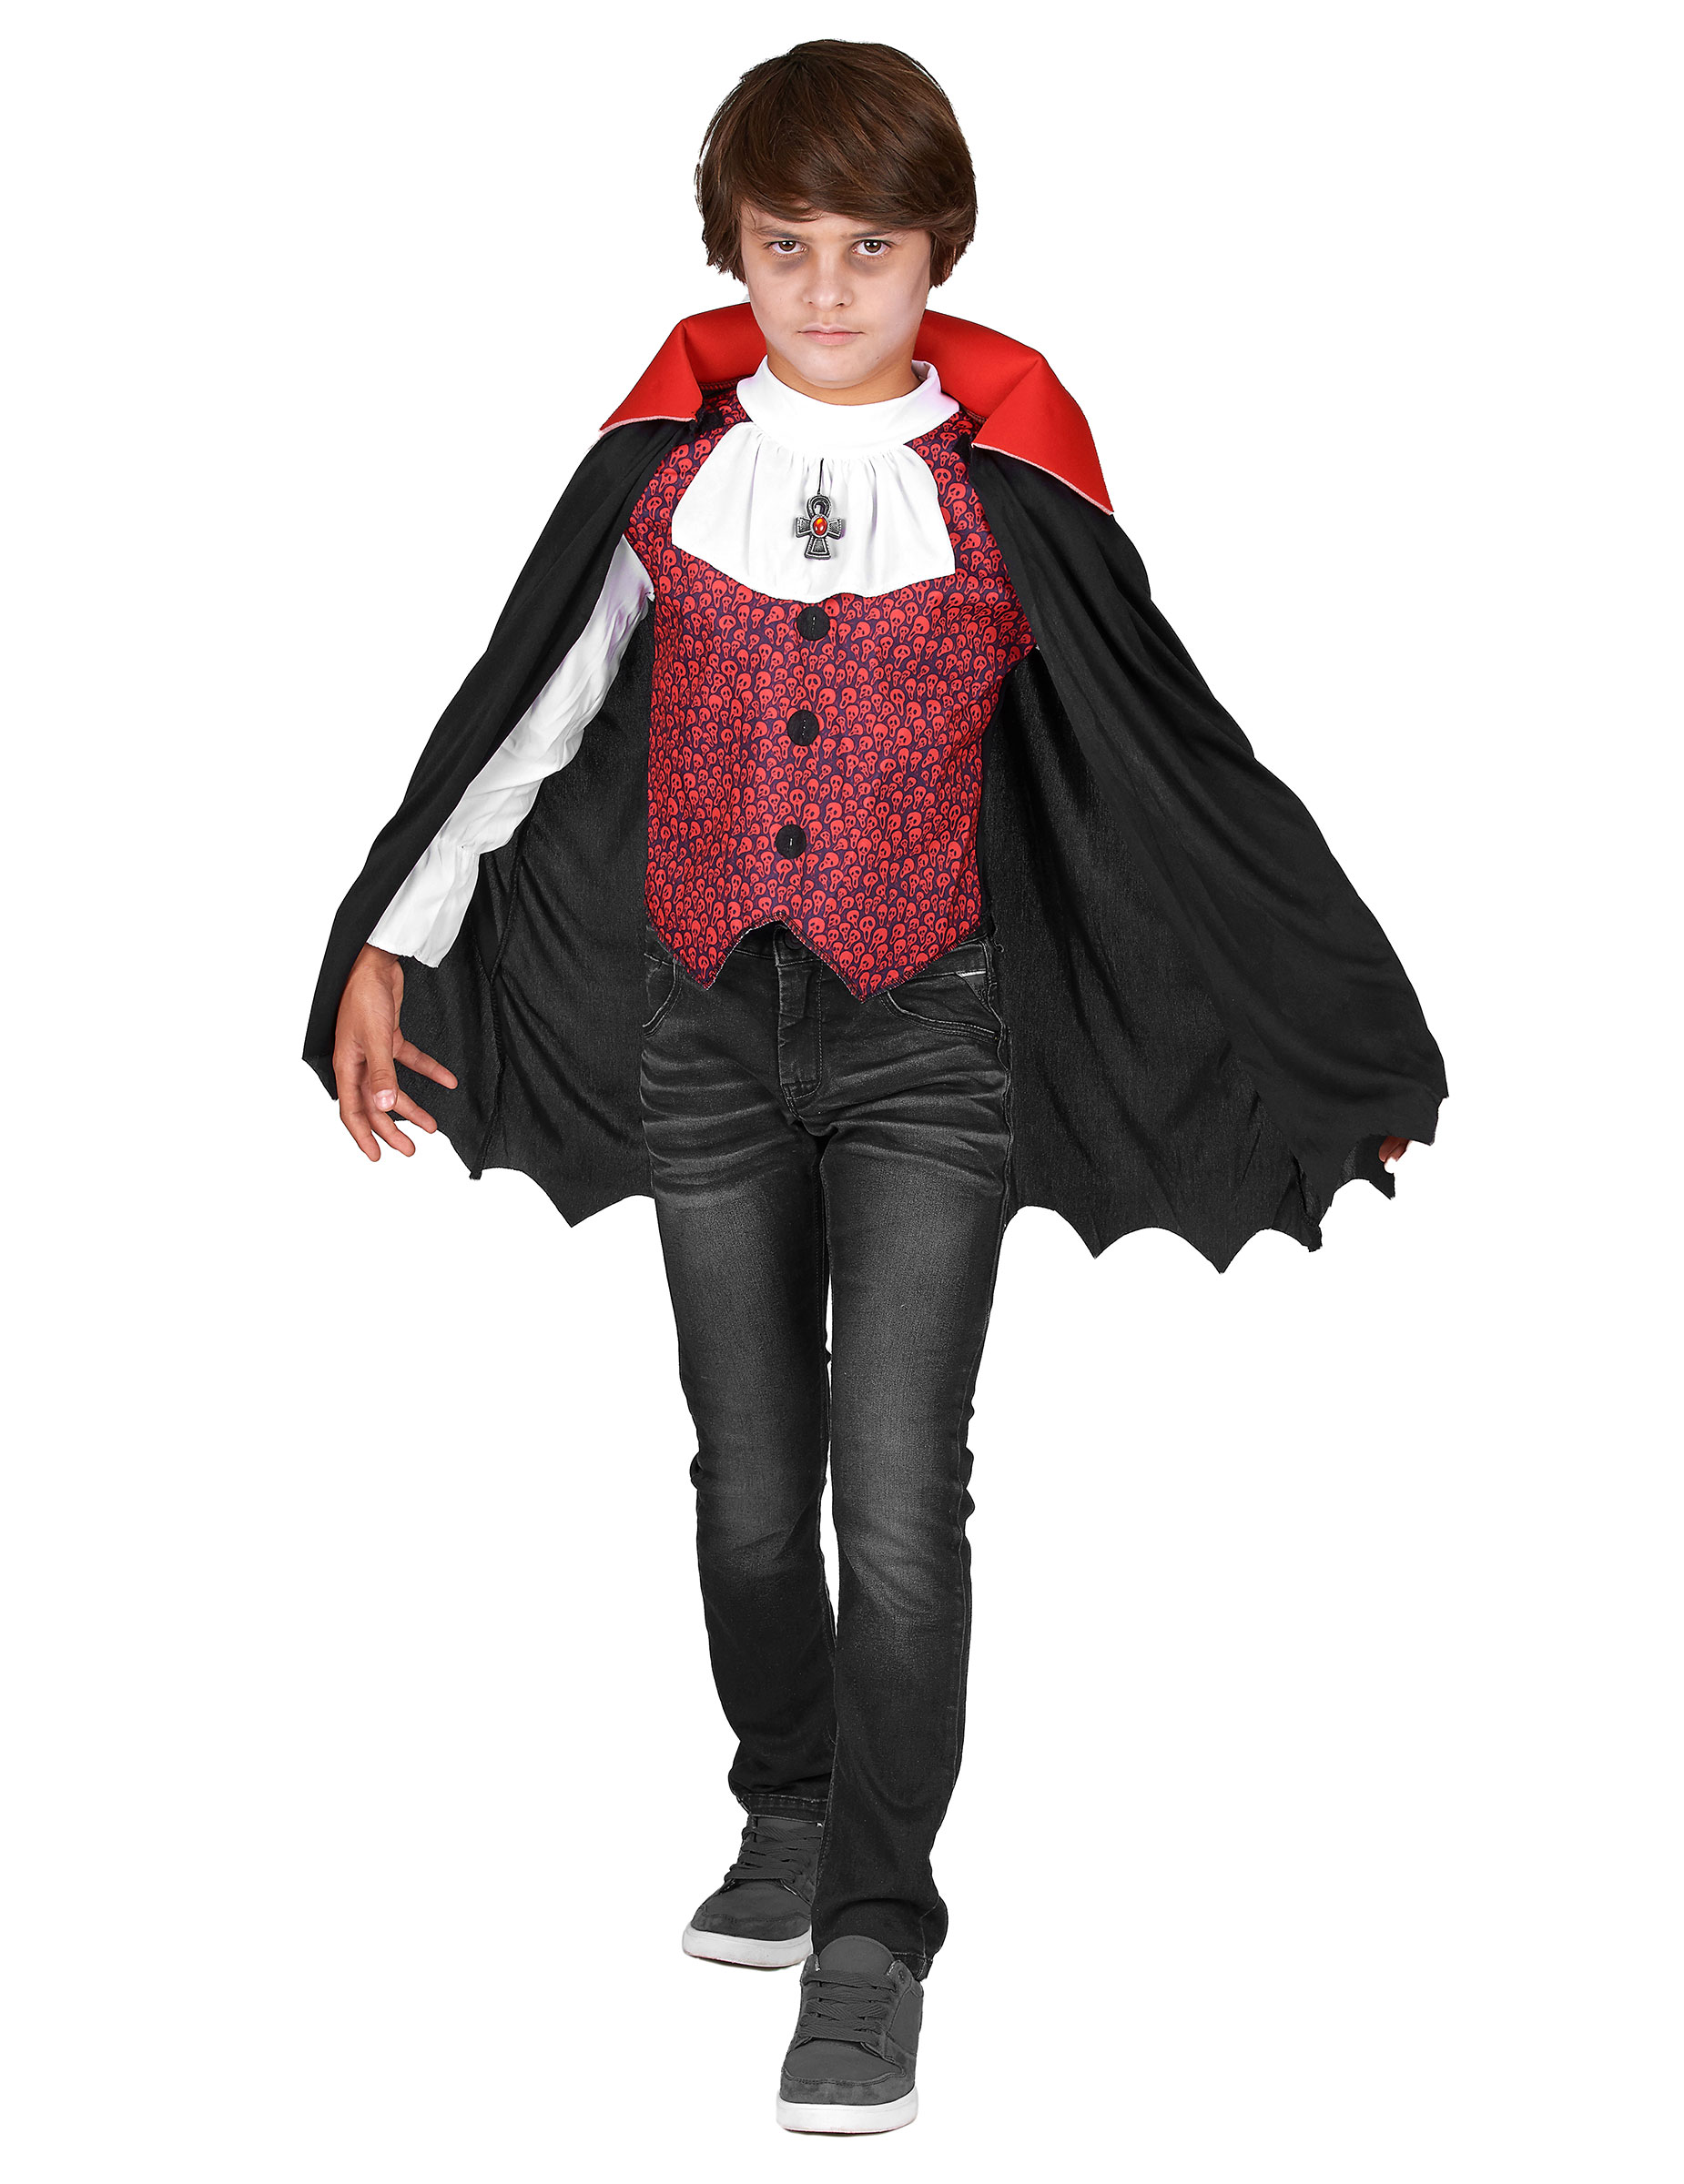 Halloween Vampire Costume : Kids Costumes, and fancy dress costumes ...